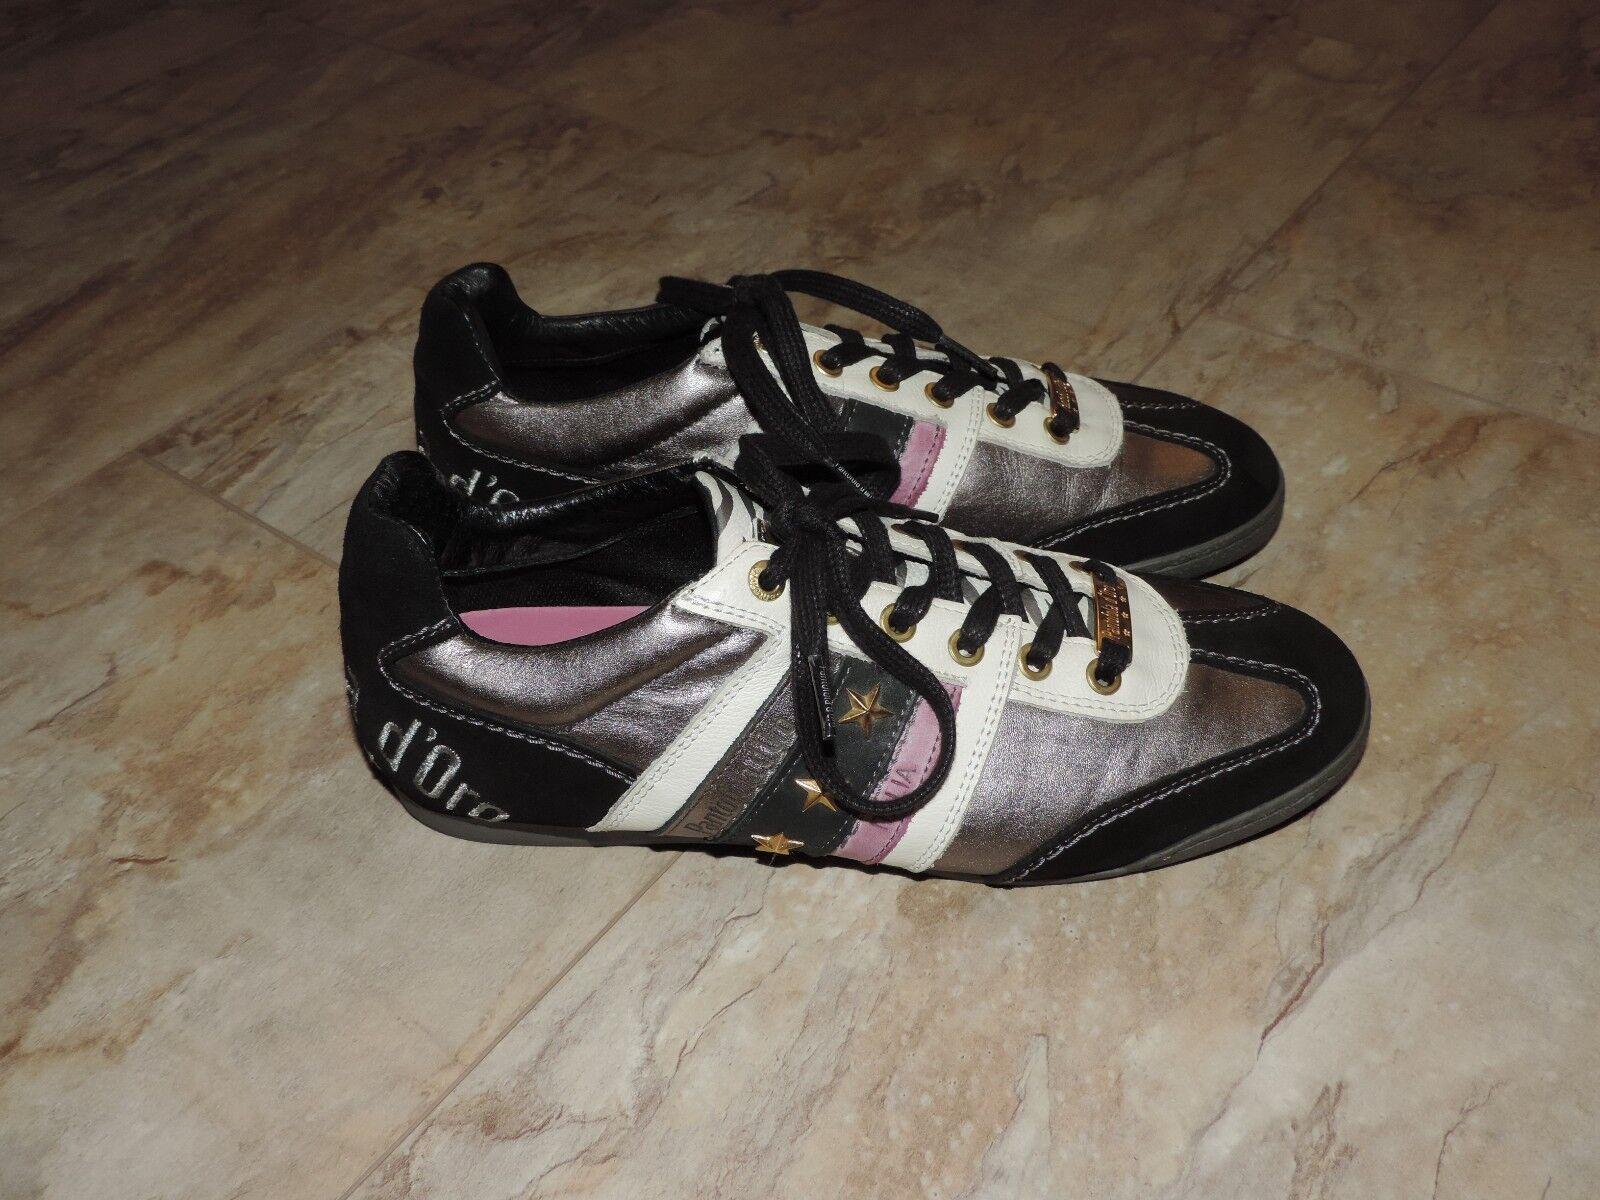 Pantafola d,Oro Herrenschuhe, - Sneaker - Herrenschuhe, Gr. 41 f7b557